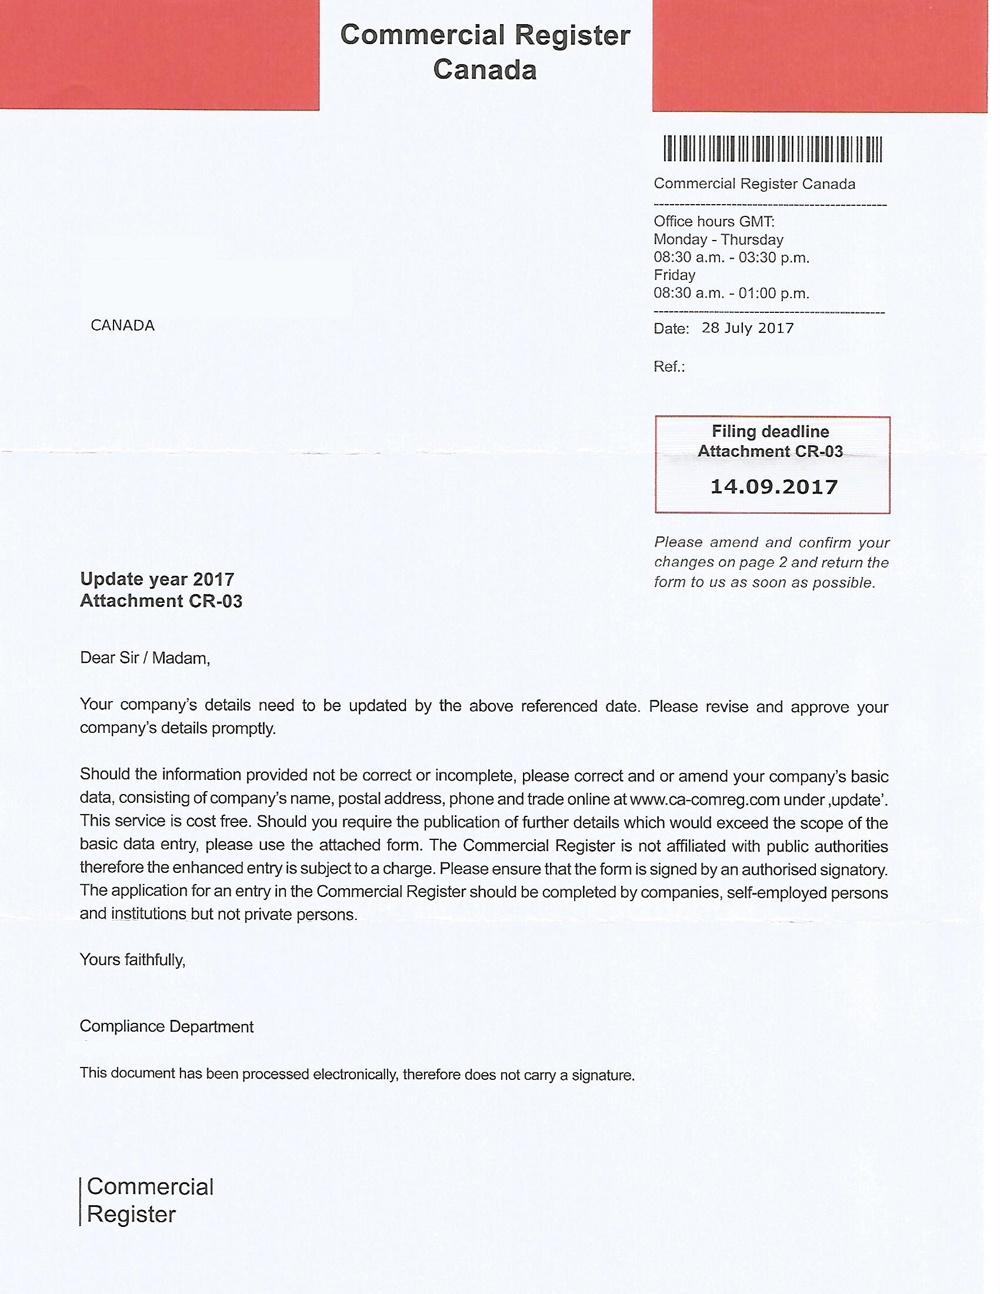 Commercial Register Canada letter